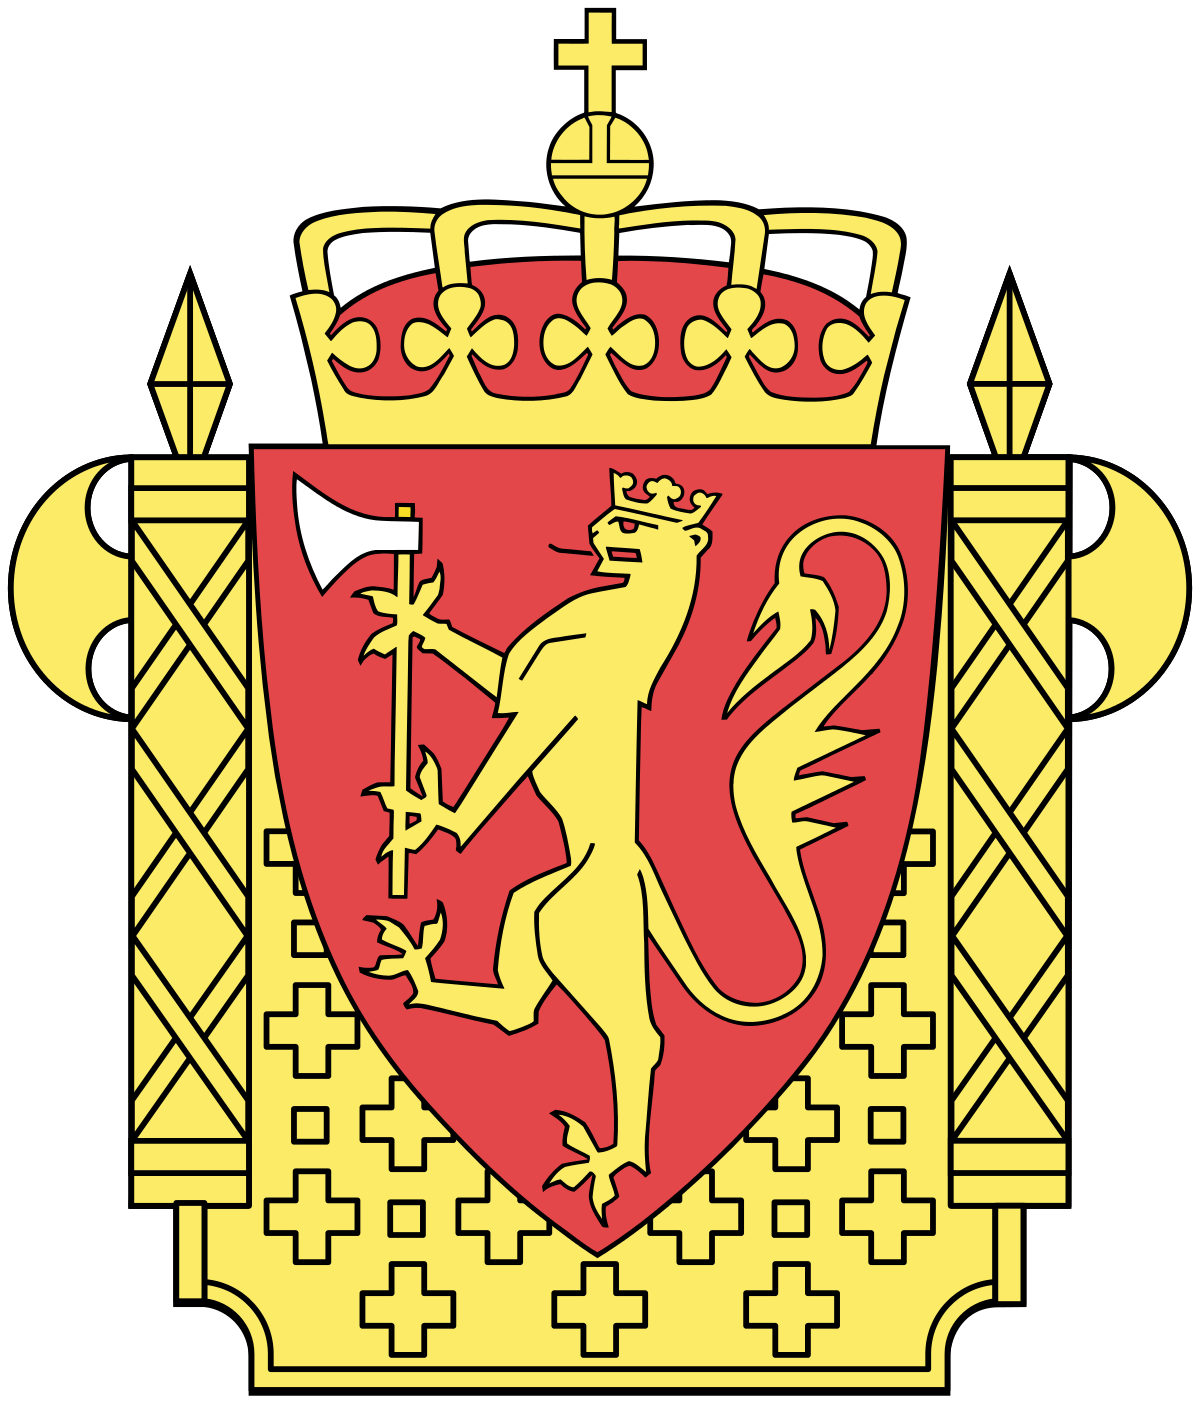 Pistol clipart military police. Norwegian service wikipedia